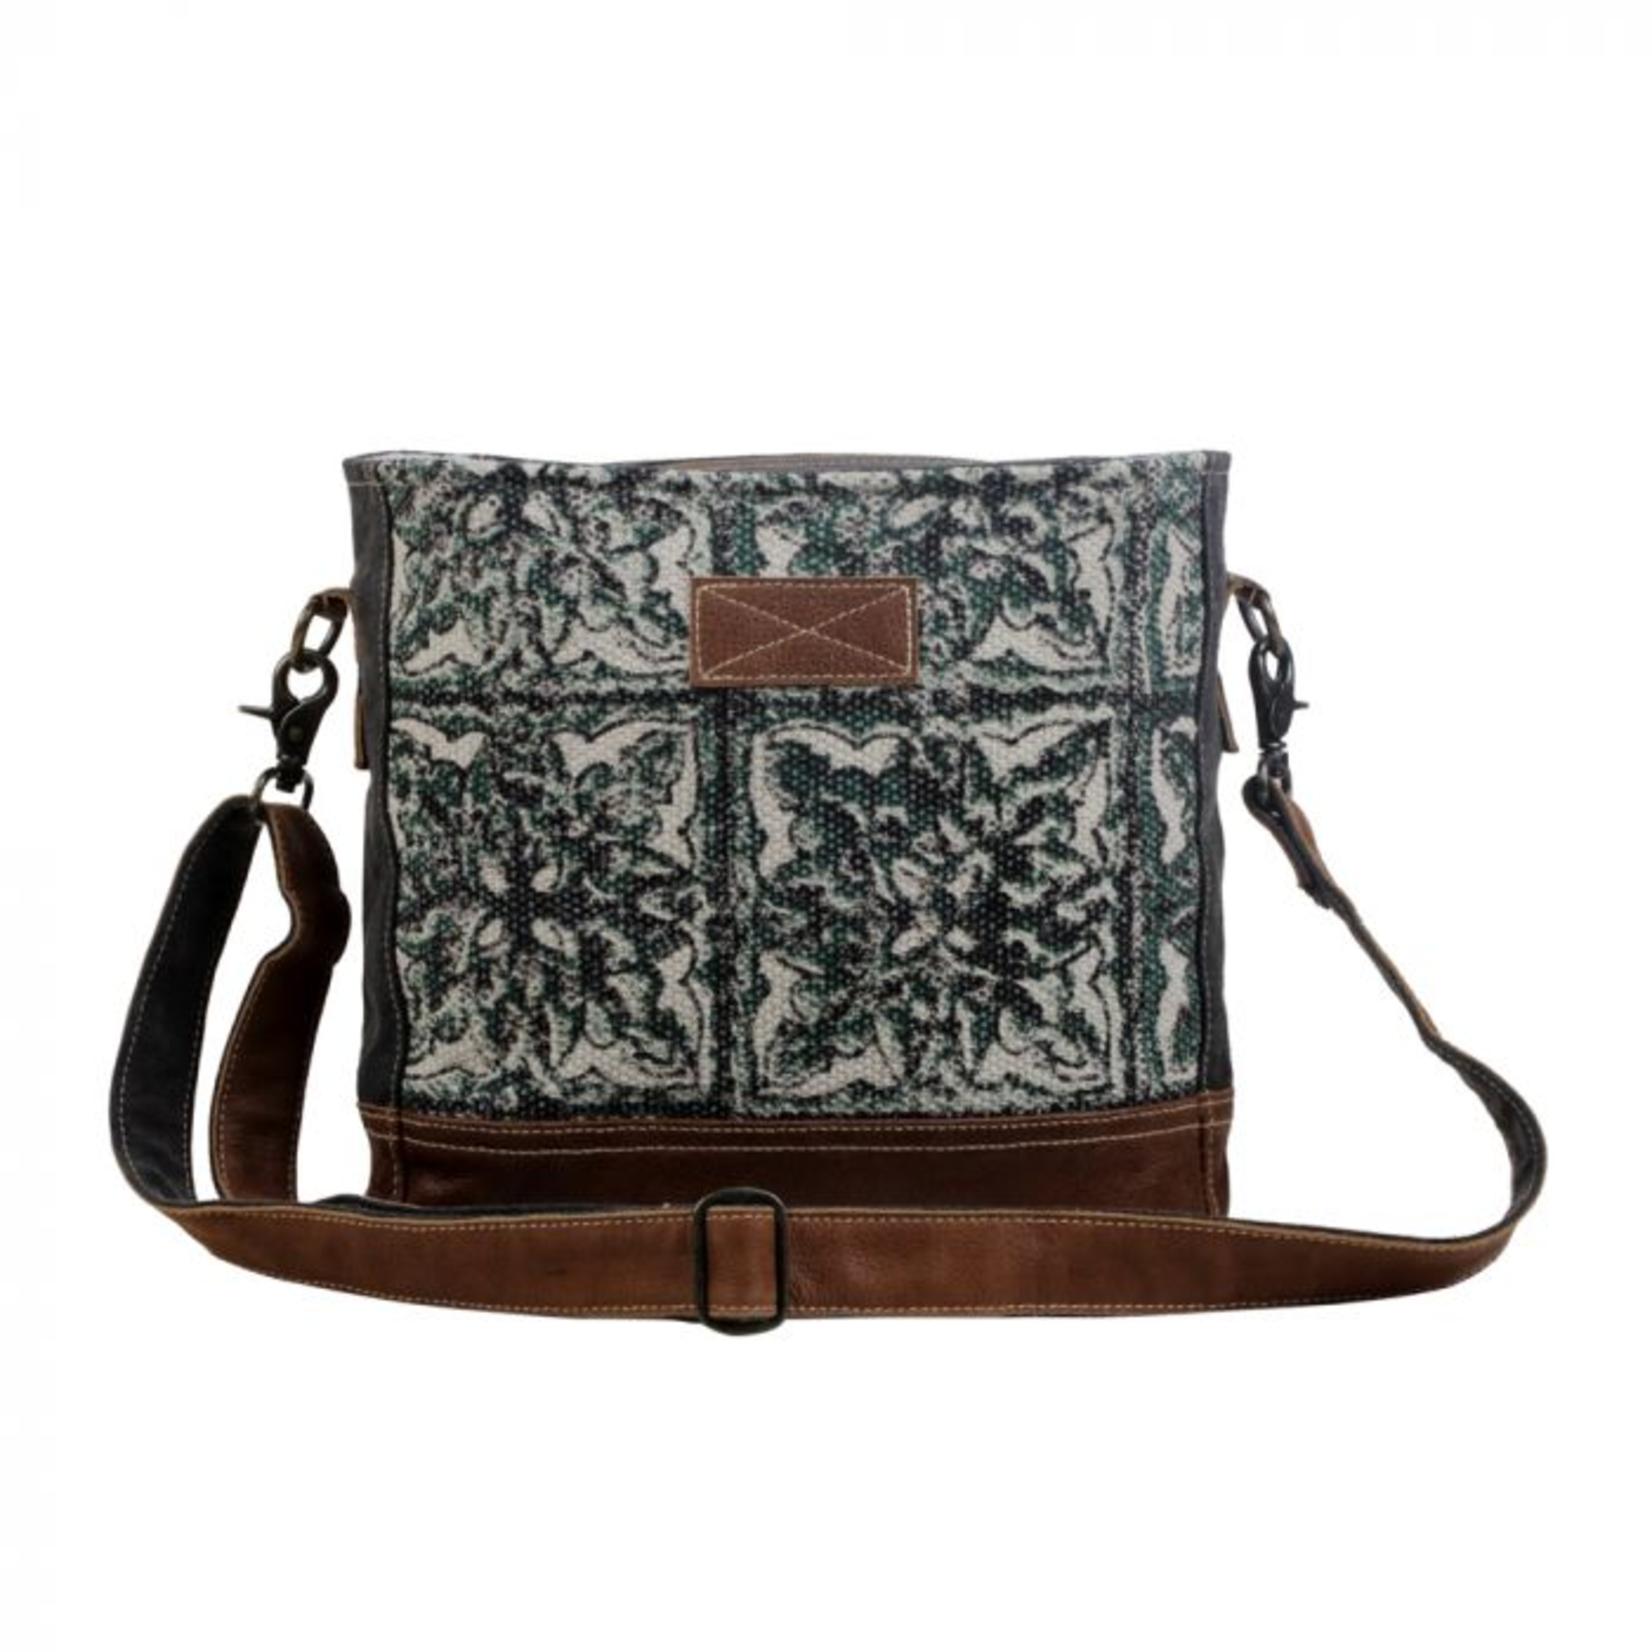 Myra Bag Bag: Labyrinthian Small Crossbody